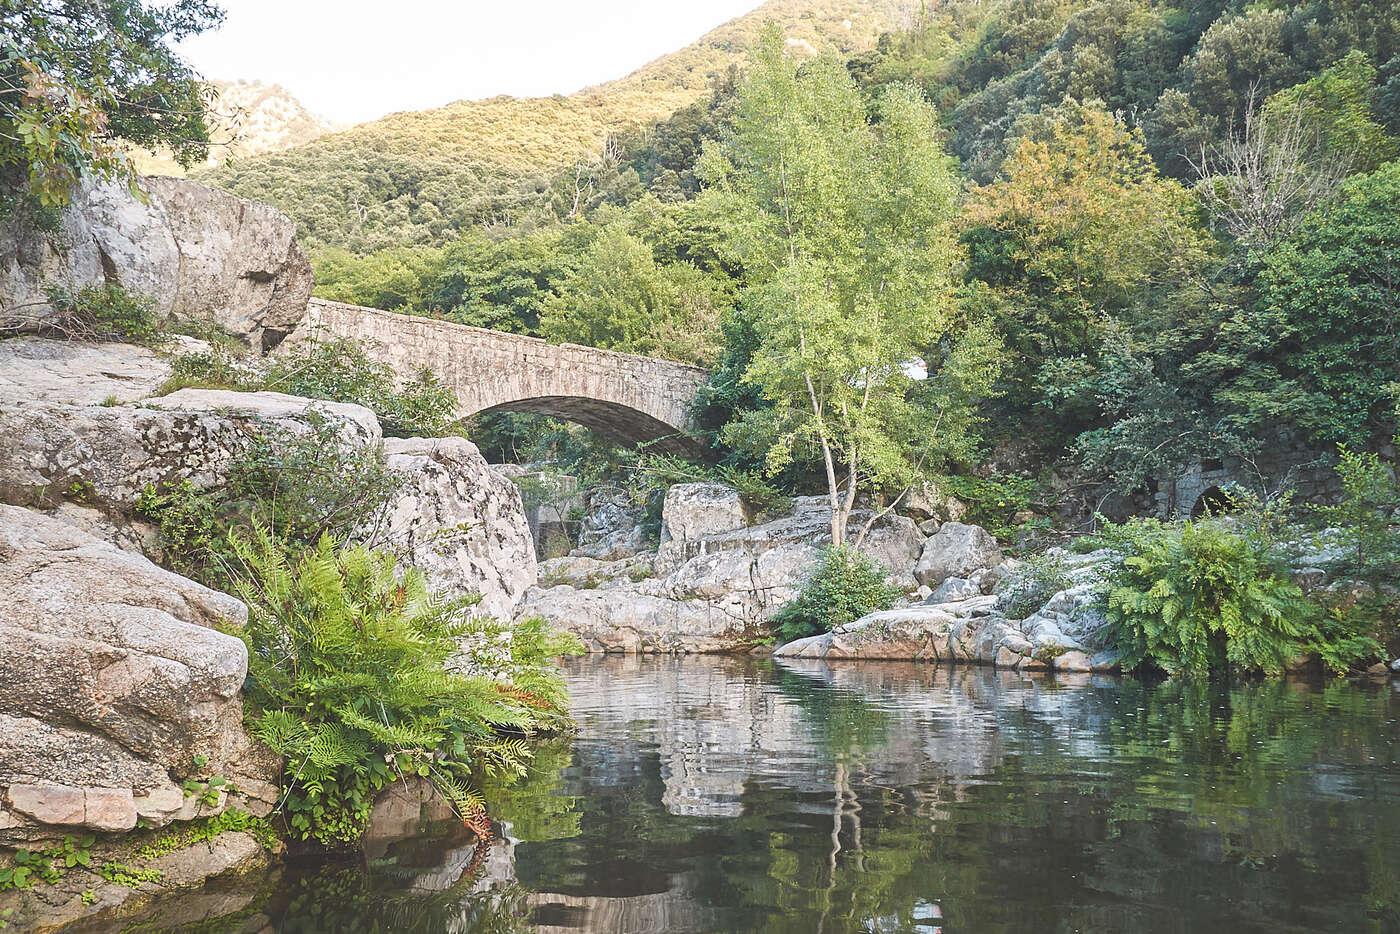 Rivière de Zoza, en Corse